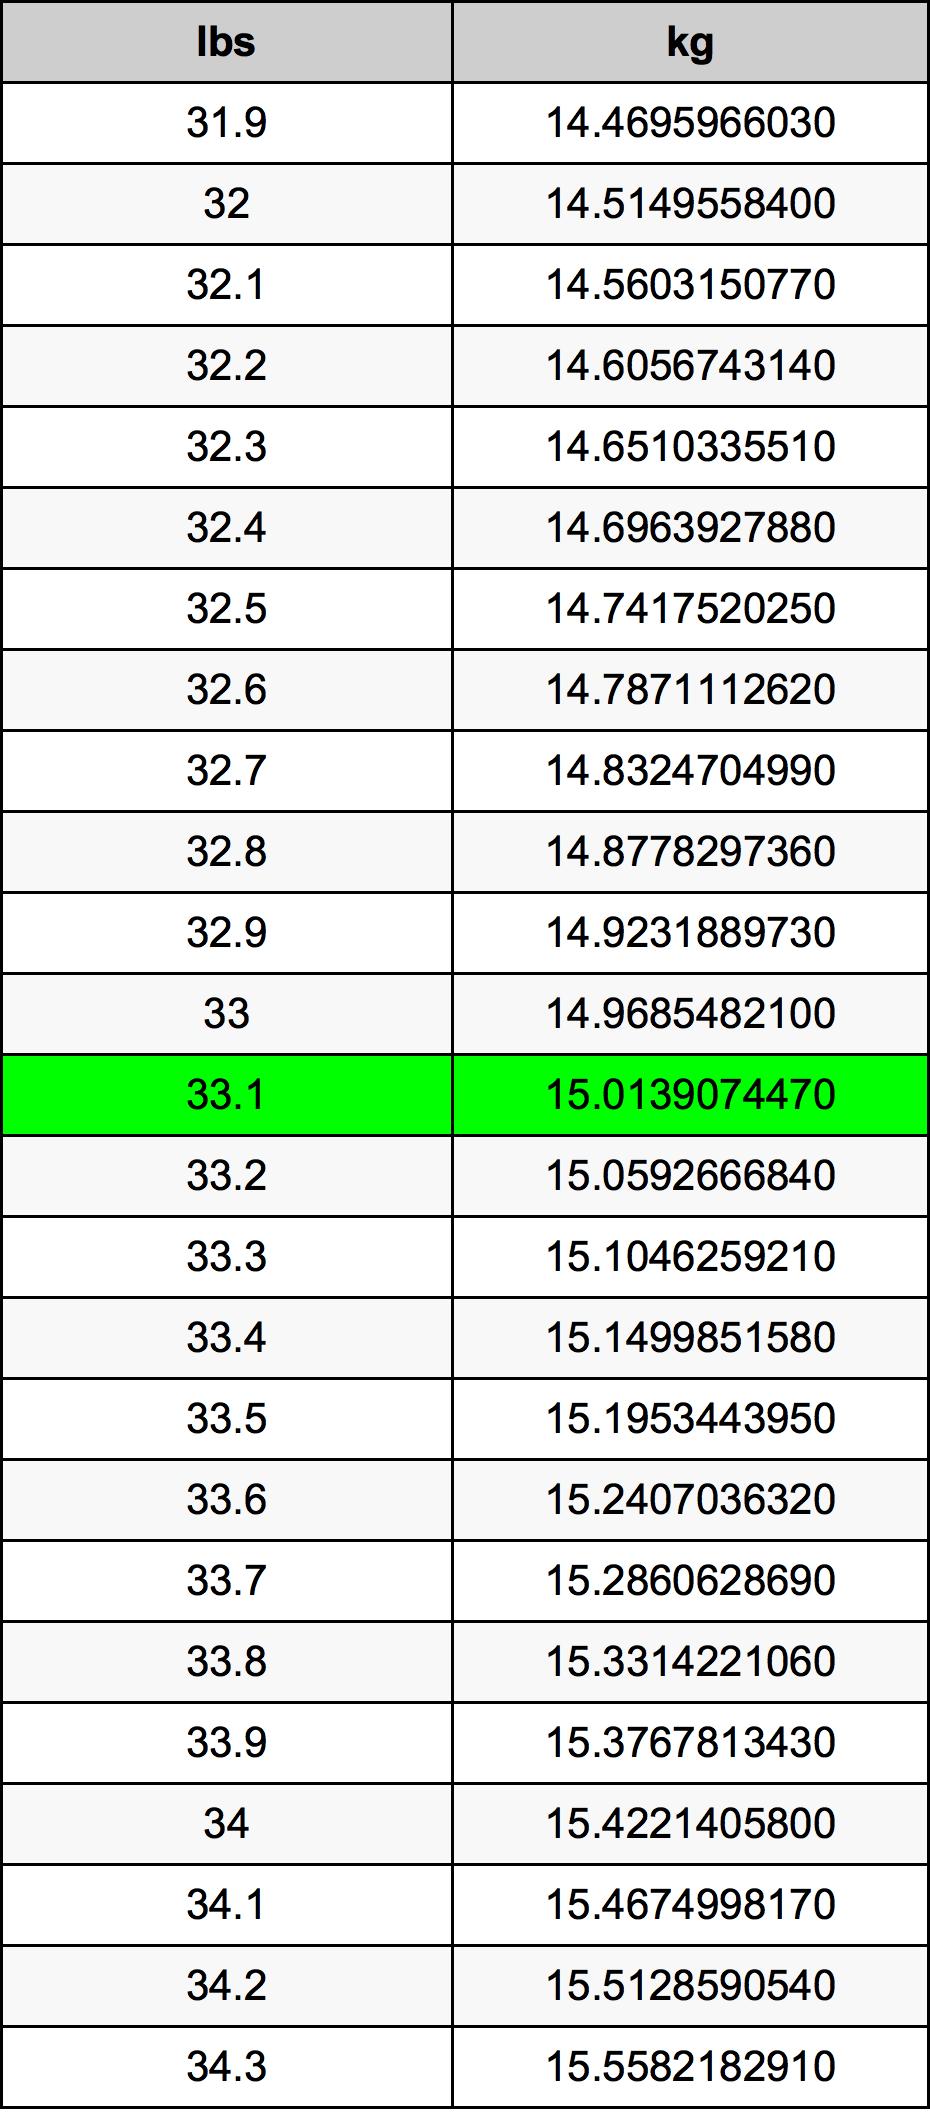 33.1 Libra konverteringstabellen